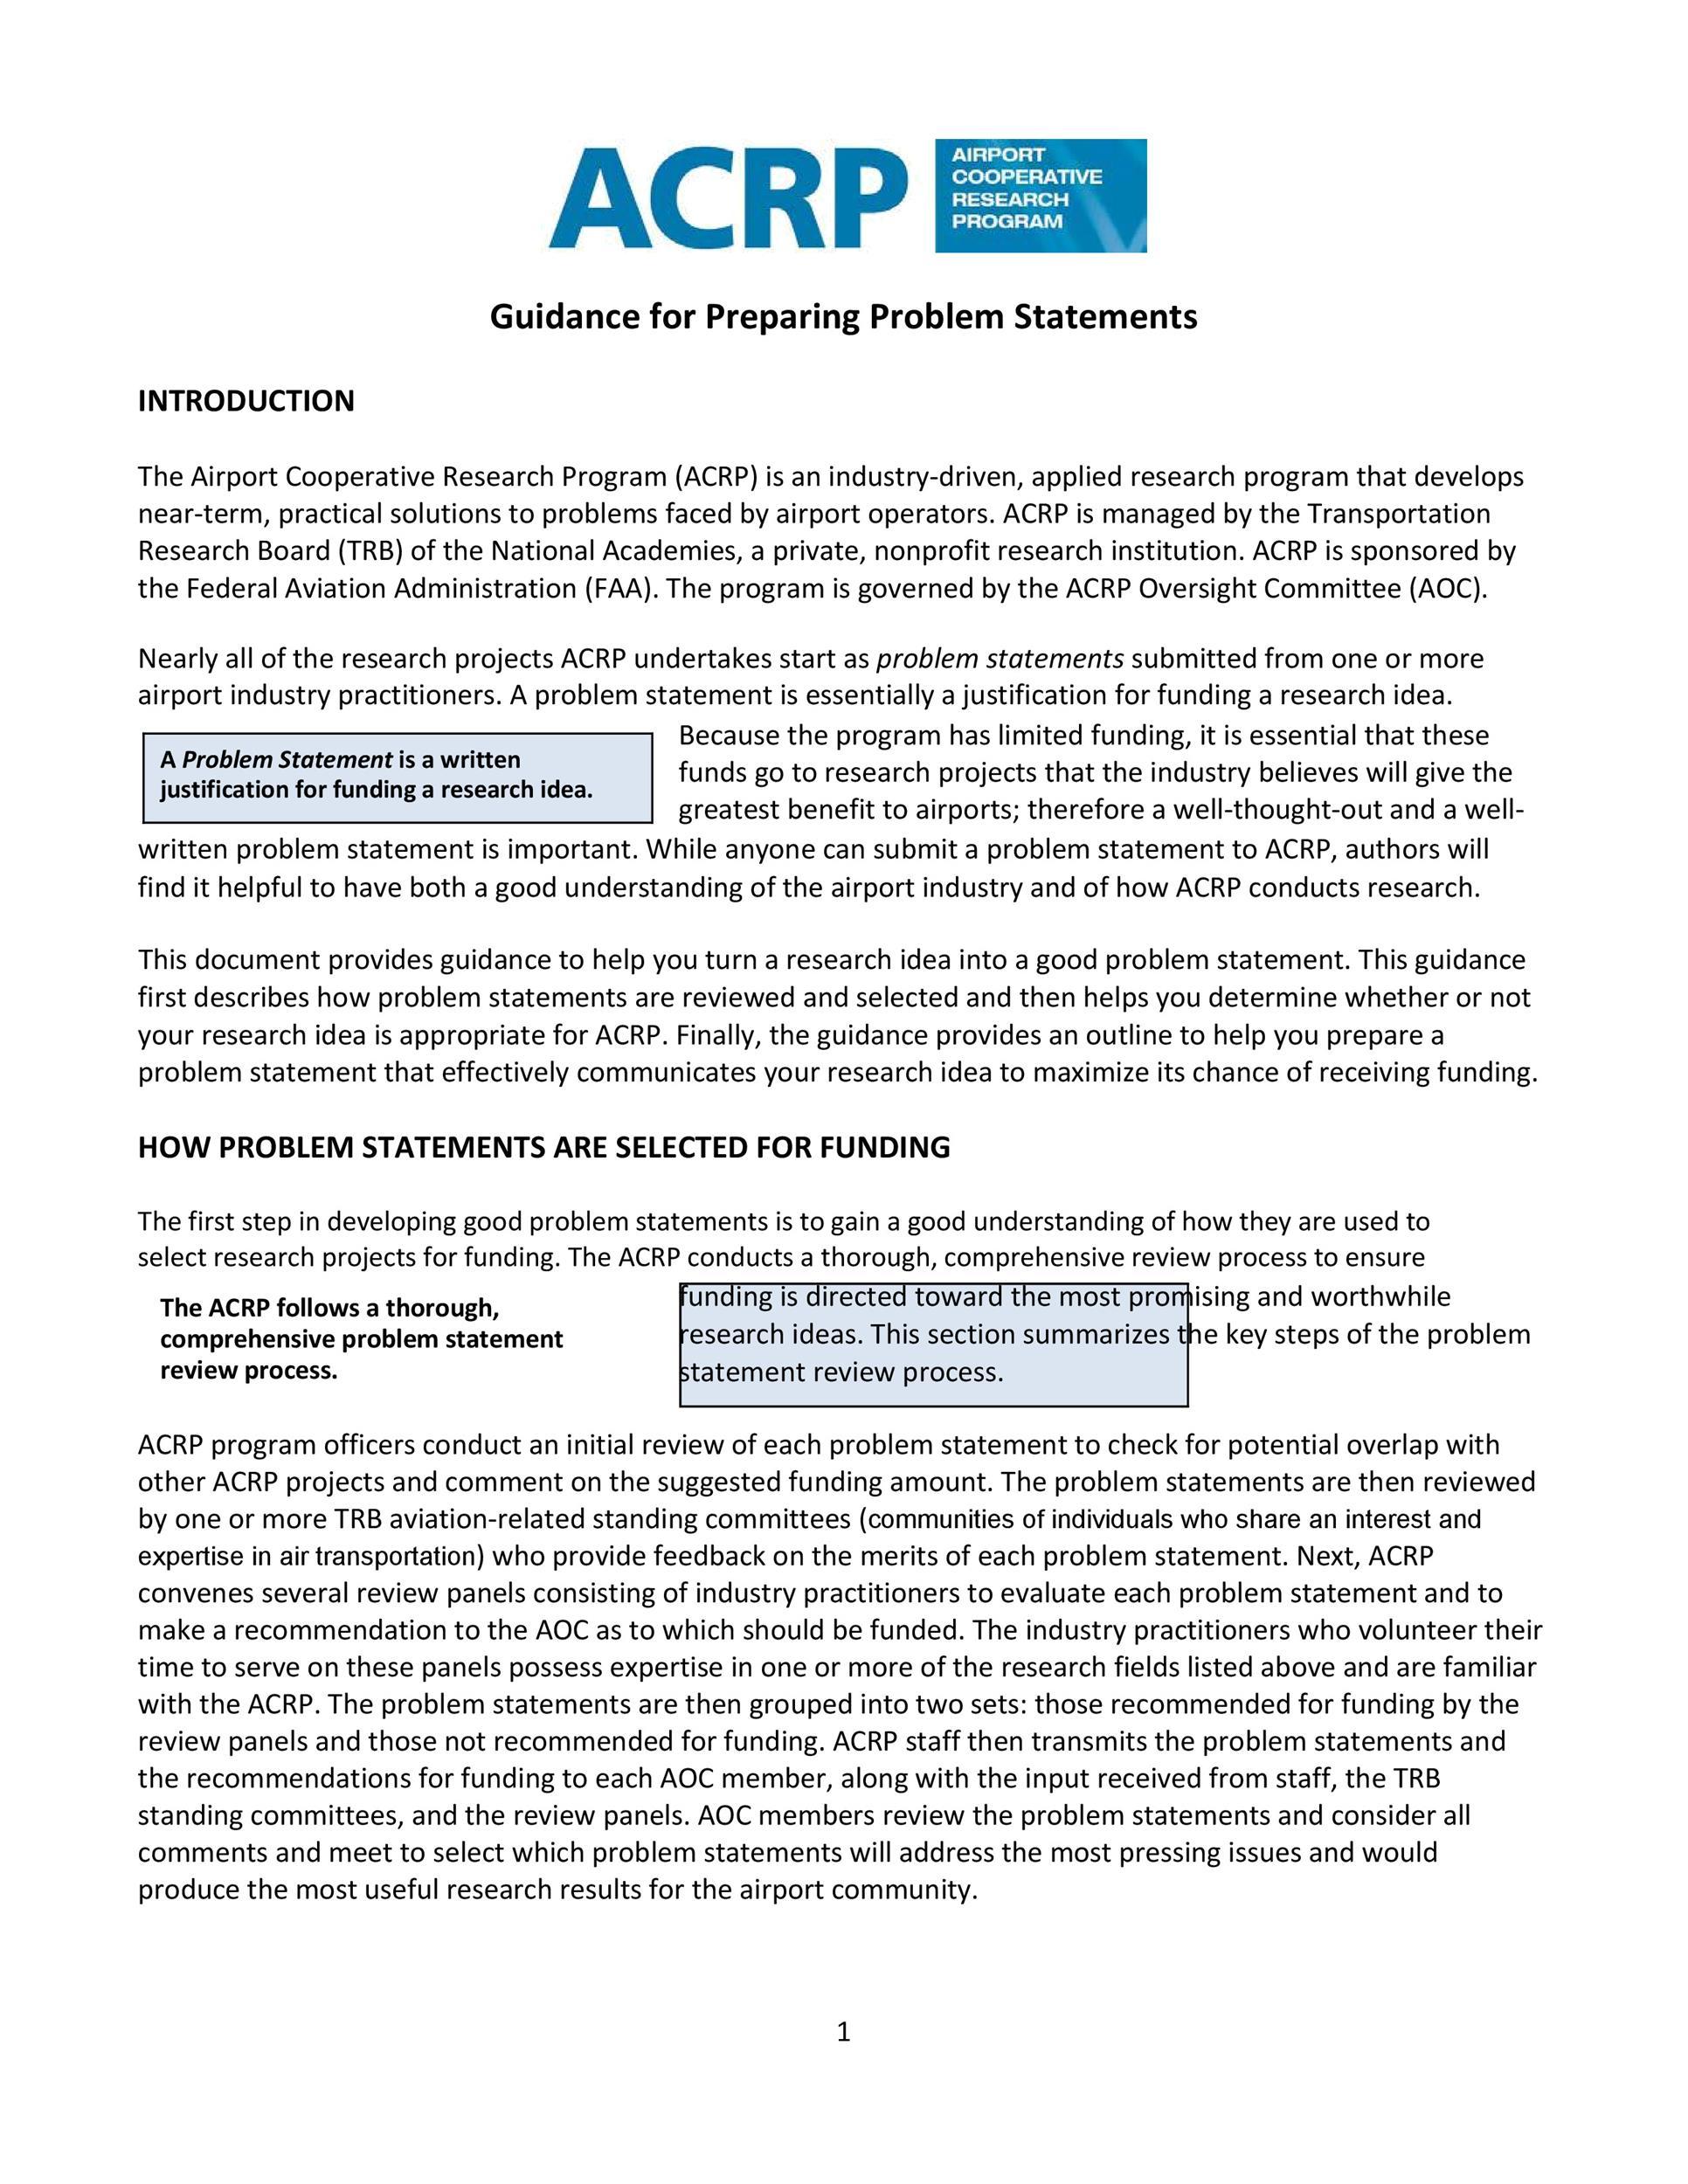 Free Problem Statement Template 18